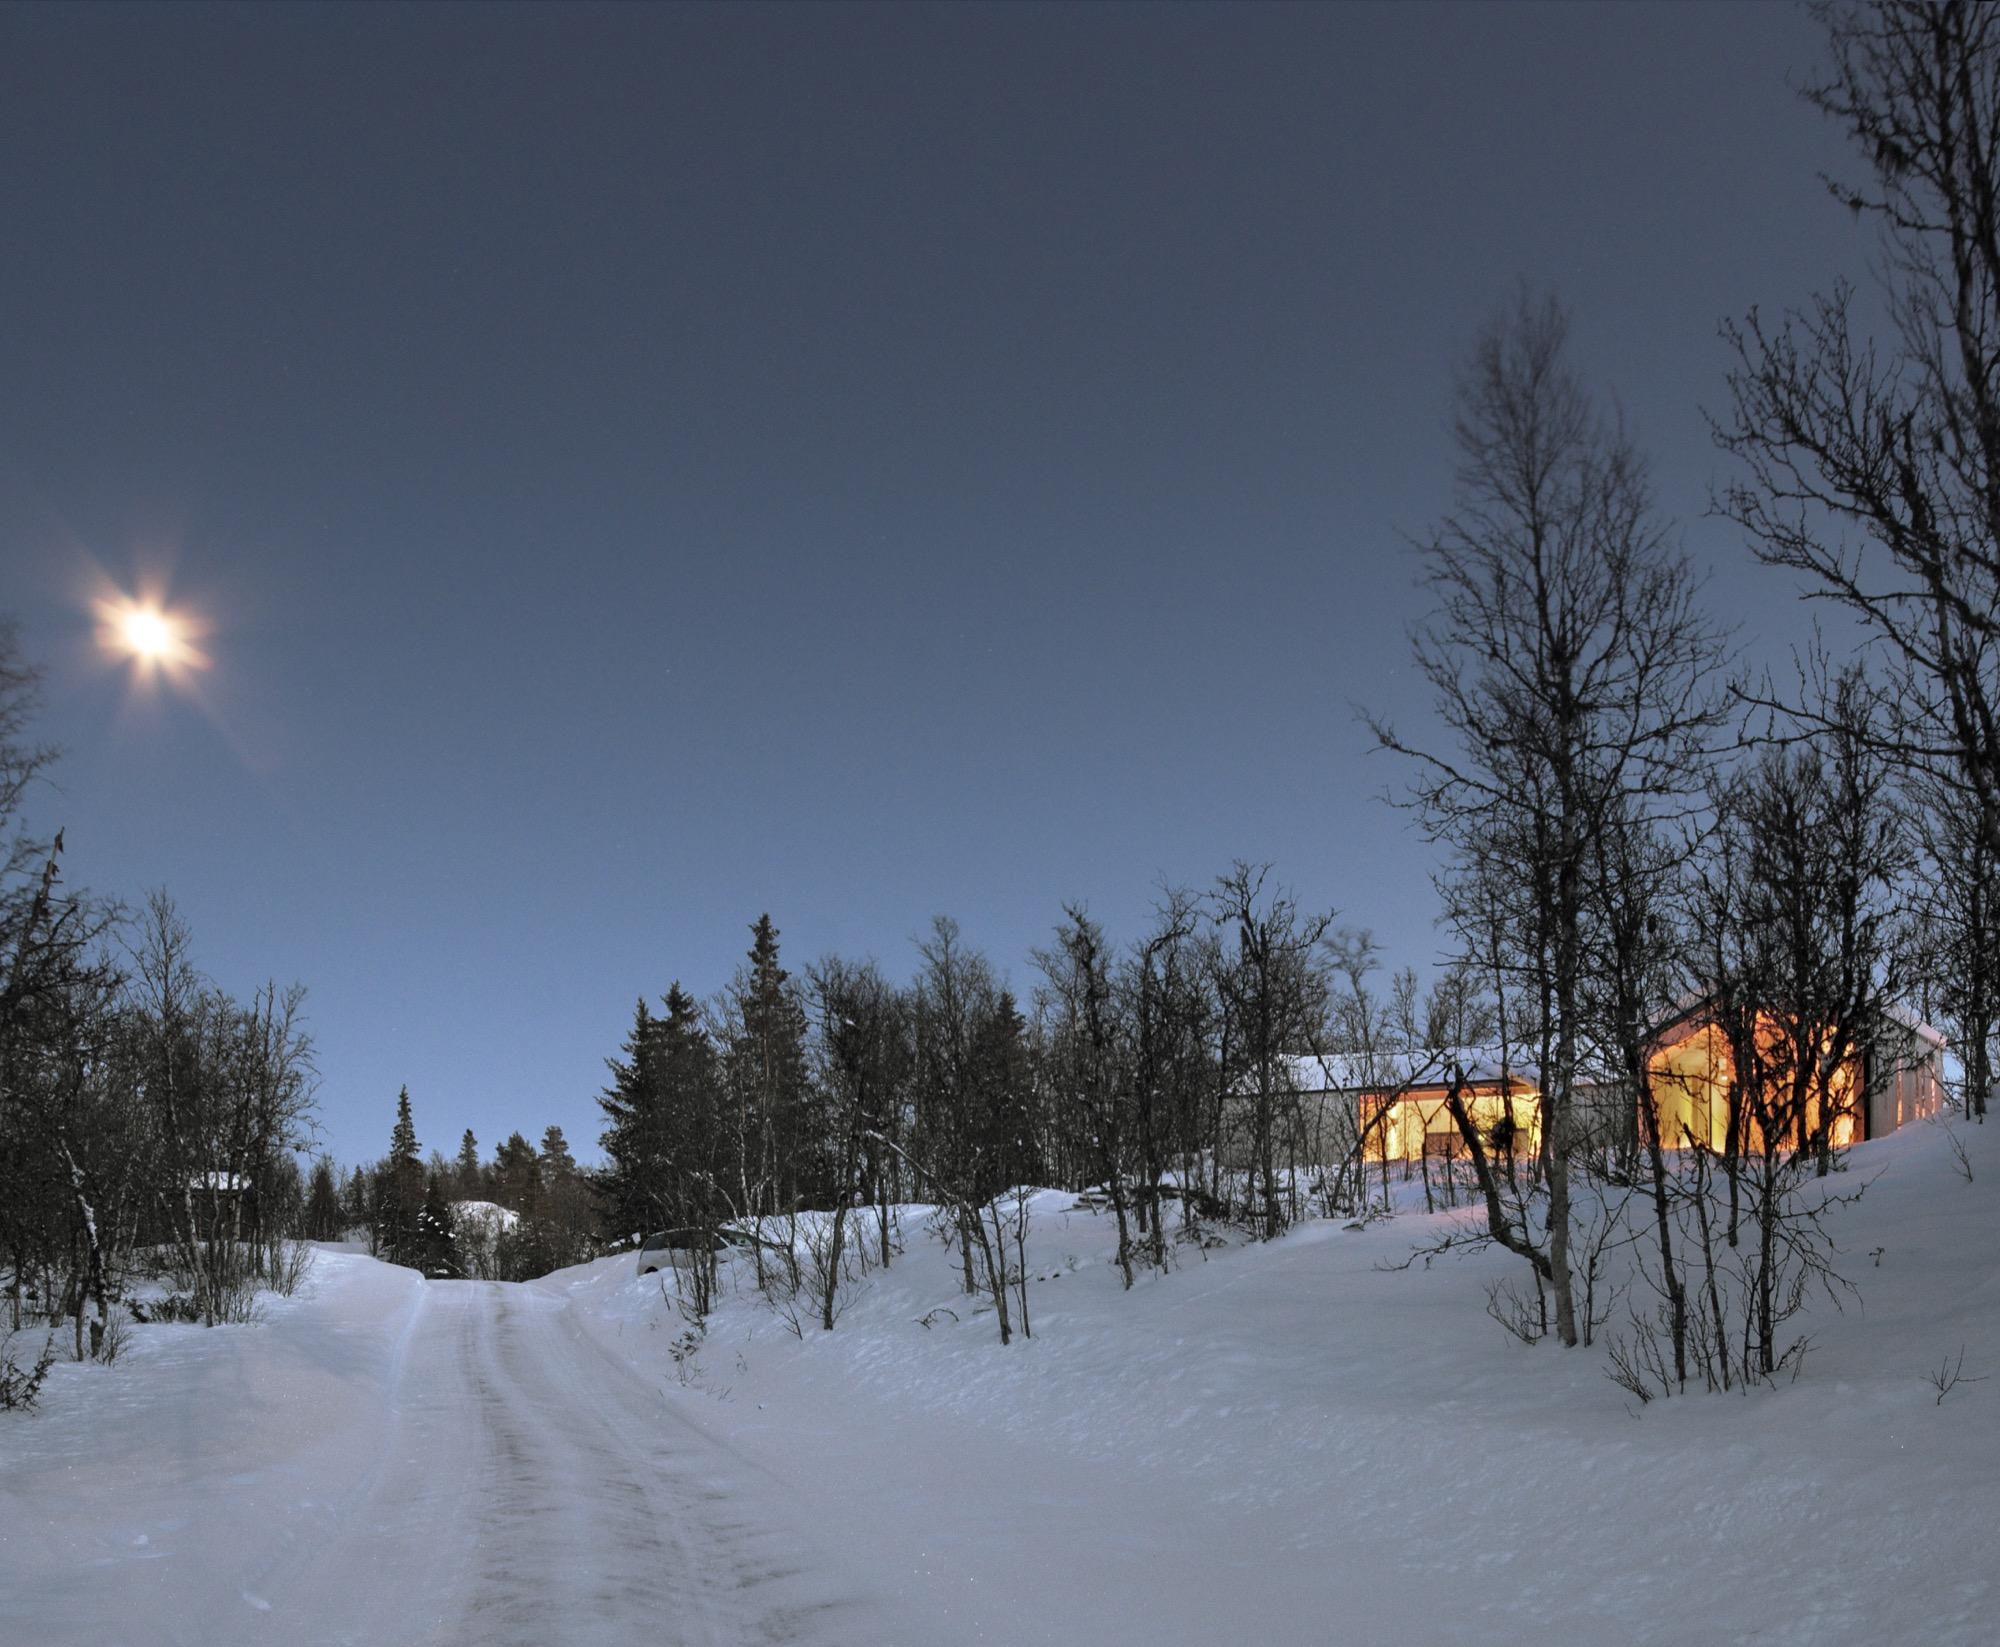 Photo by Soren Harder Nielsen